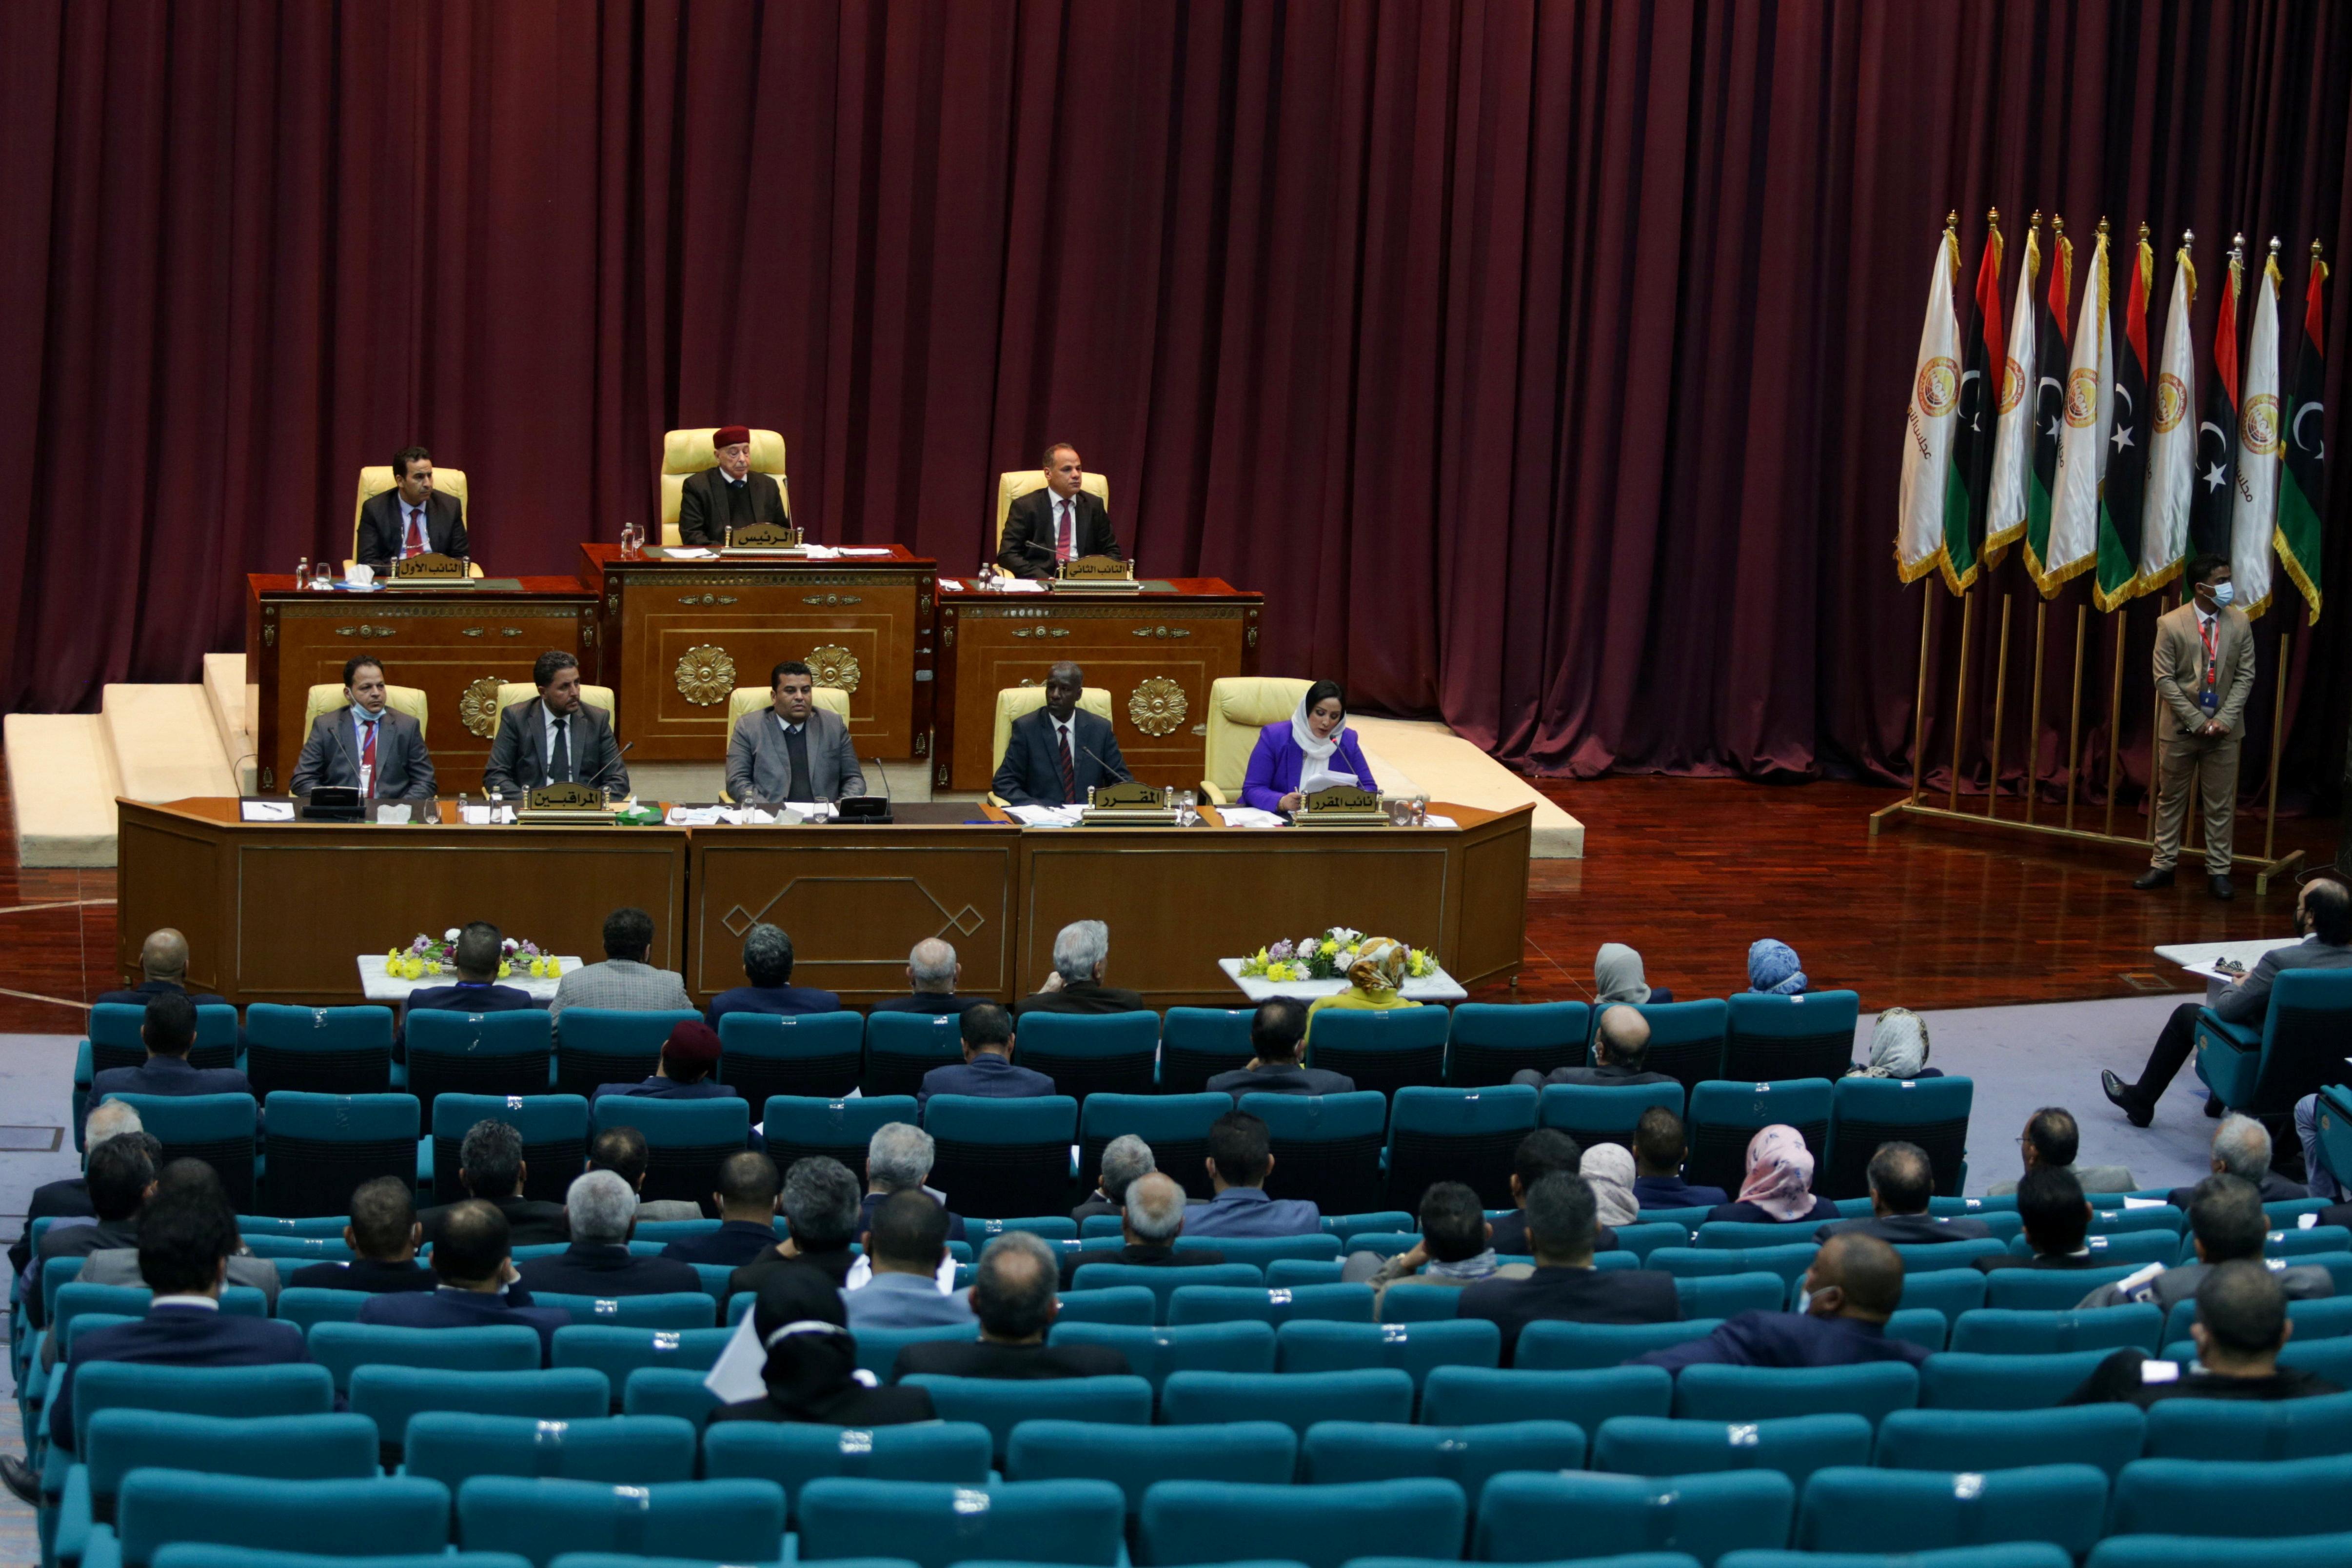 Libyan Parliament meet to discuss approving new government, in Sirte, Libya March 8, 2021. REUTERS/Esam Omran Al-Fetori